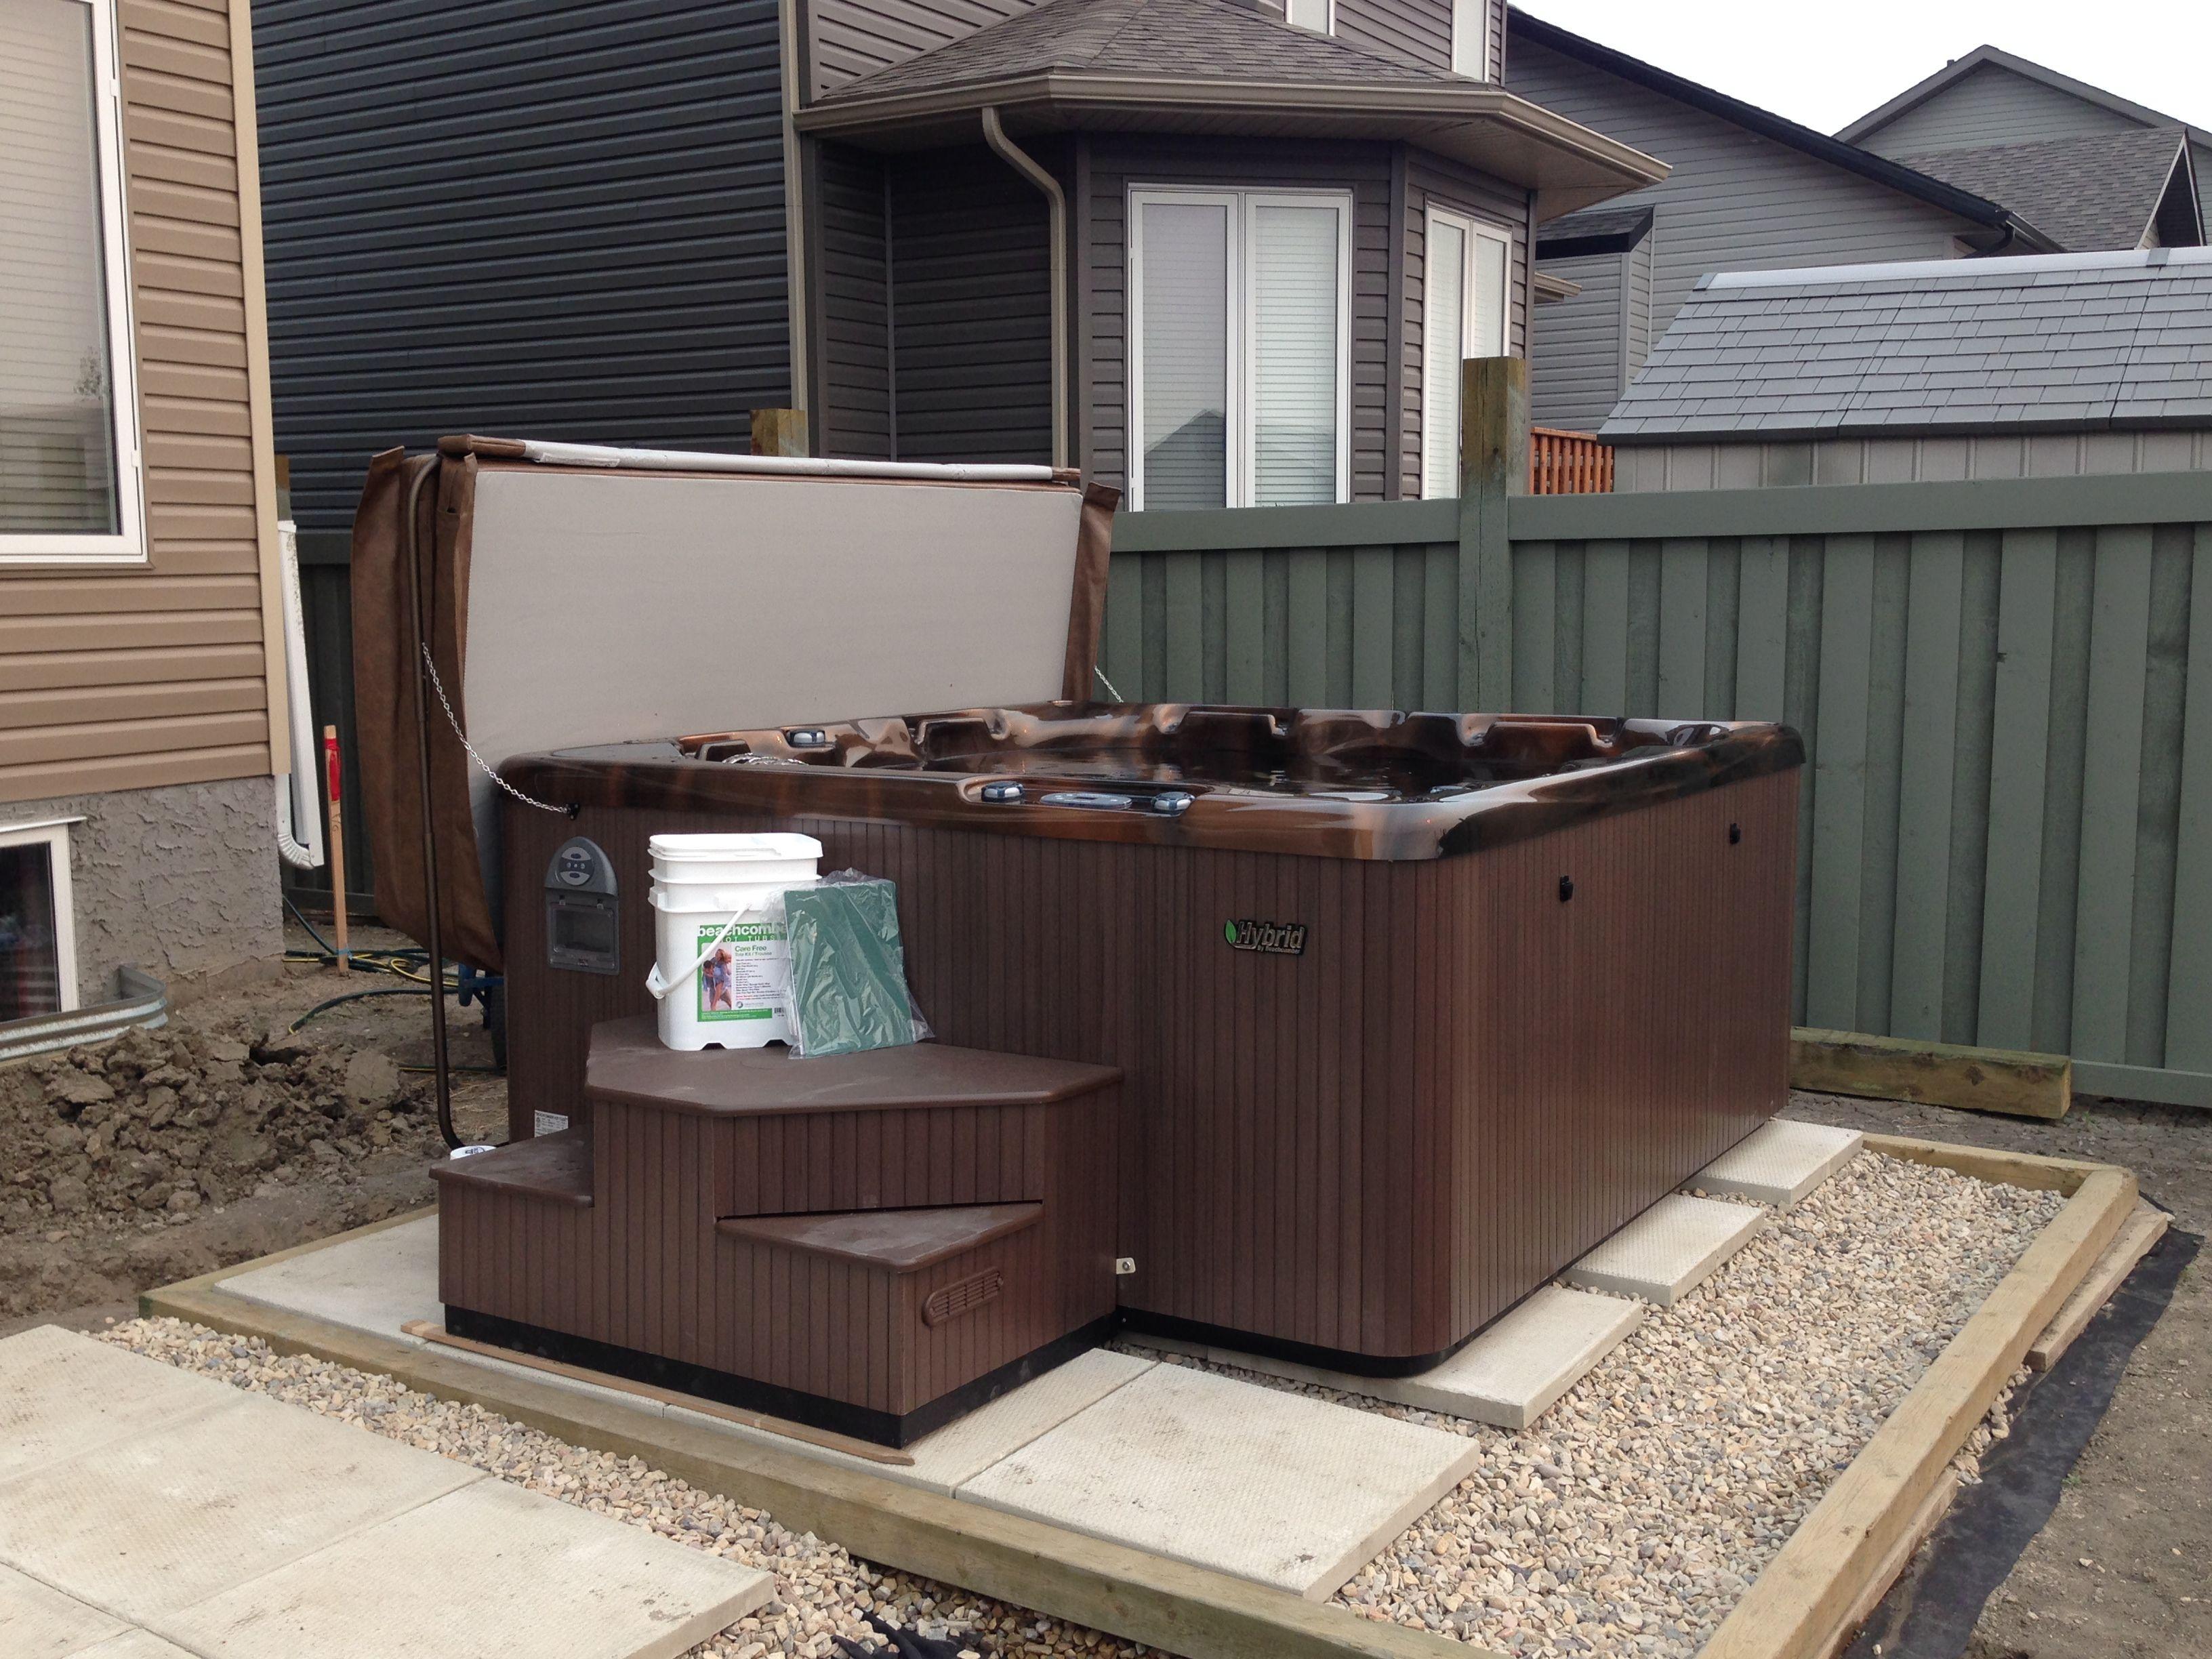 Model 580 Install Hot tub, Spa pool, Beach